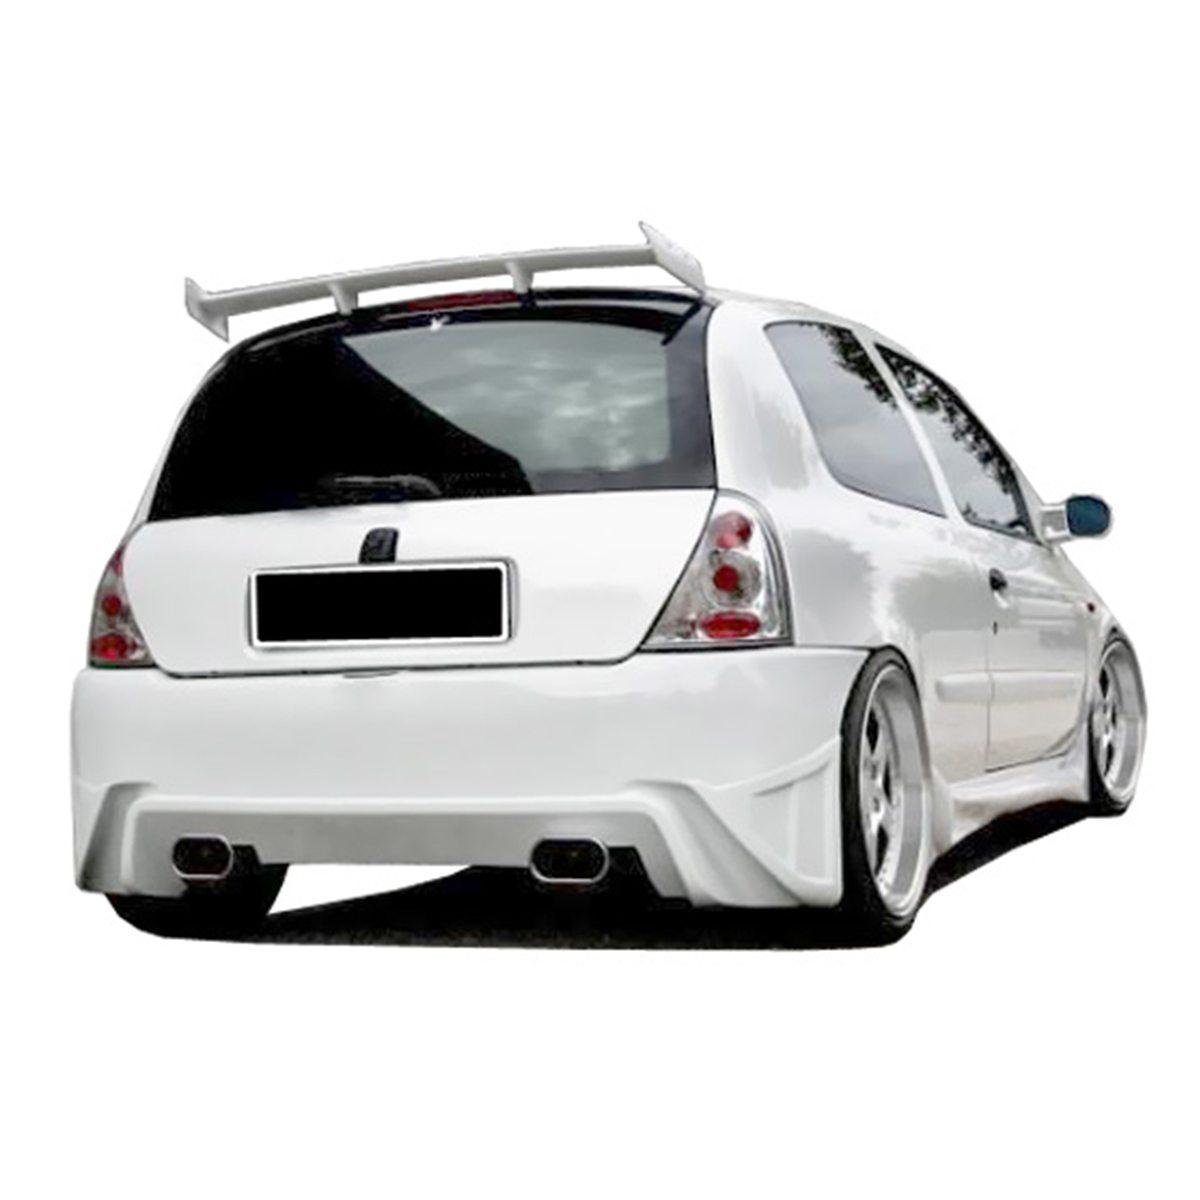 Renault-Clio-98-FOX-Tras-PCS173